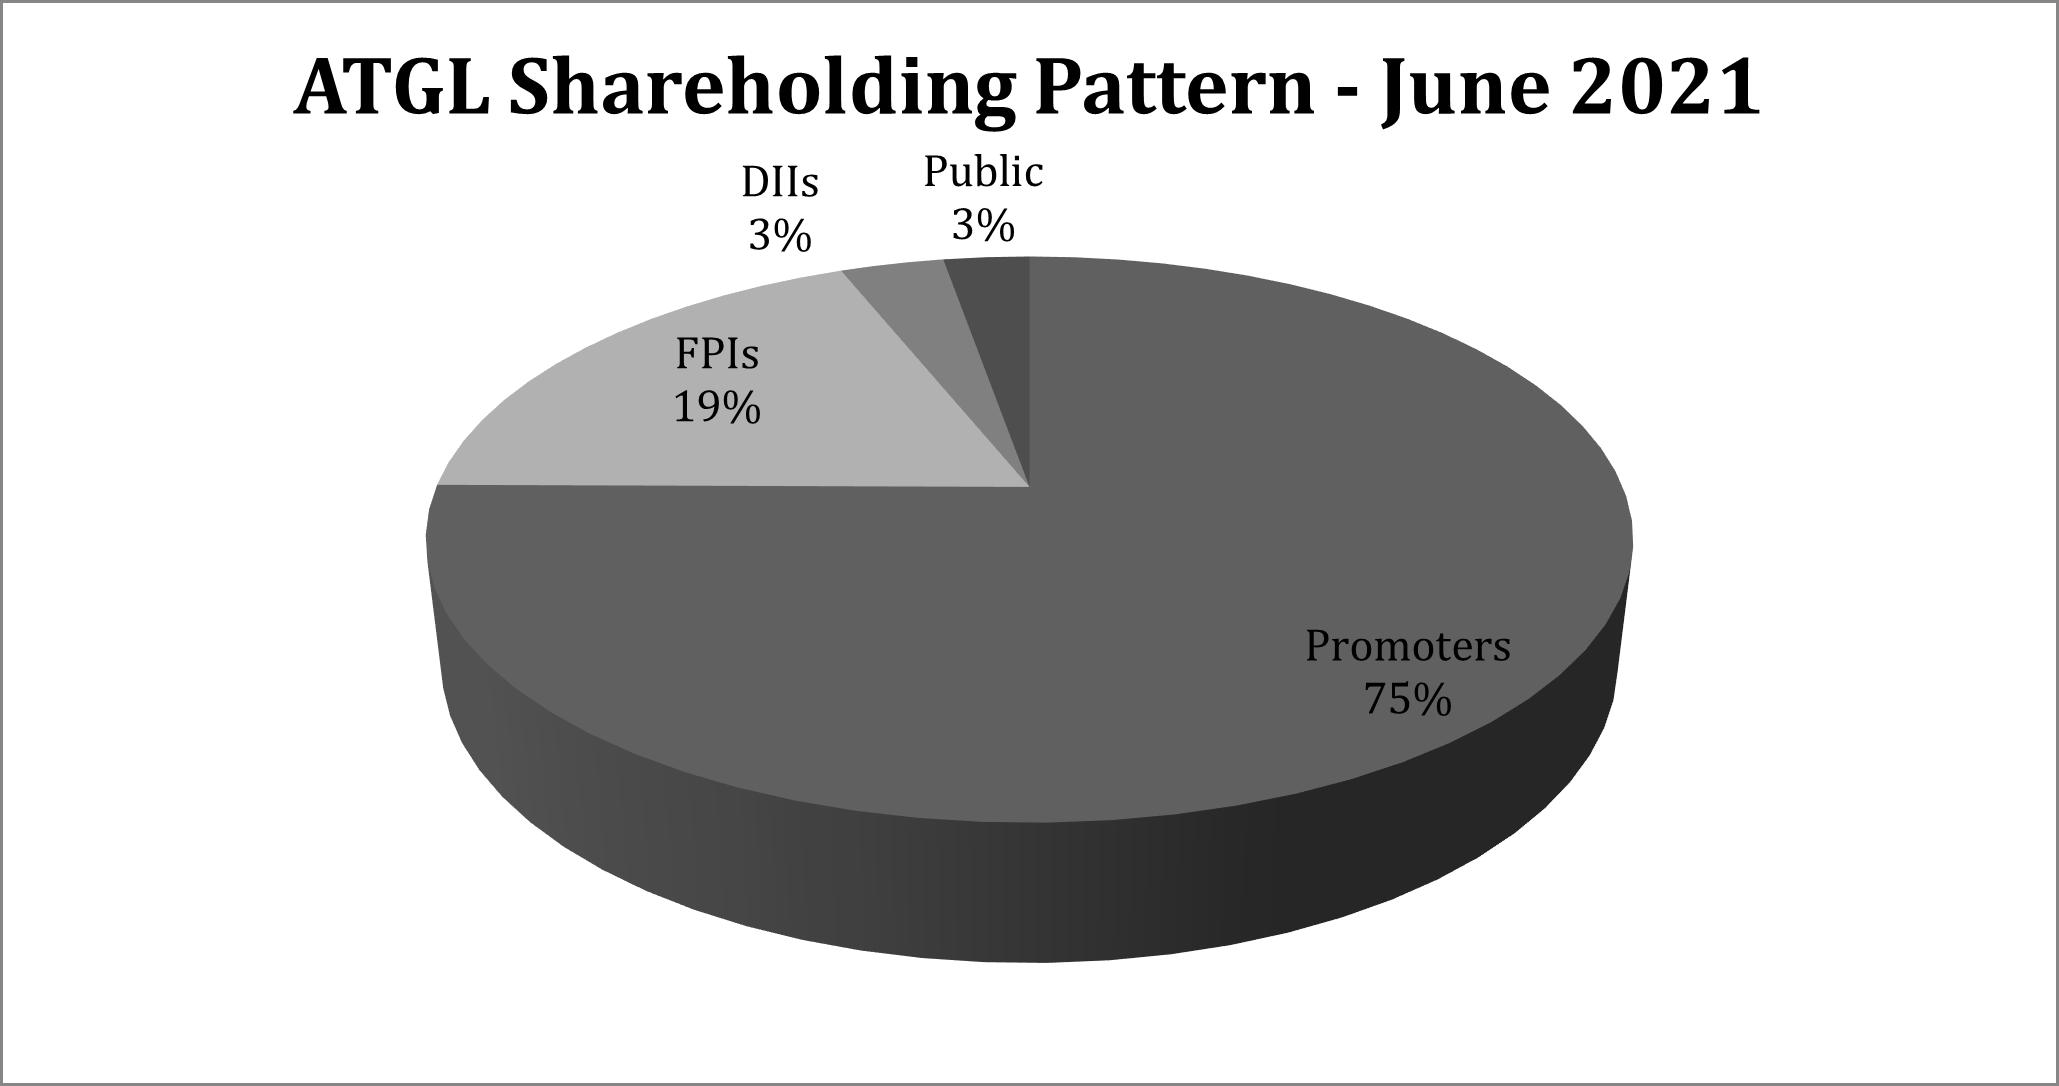 Figure 12. ATGL shareholding pattern, 30 June 2021.